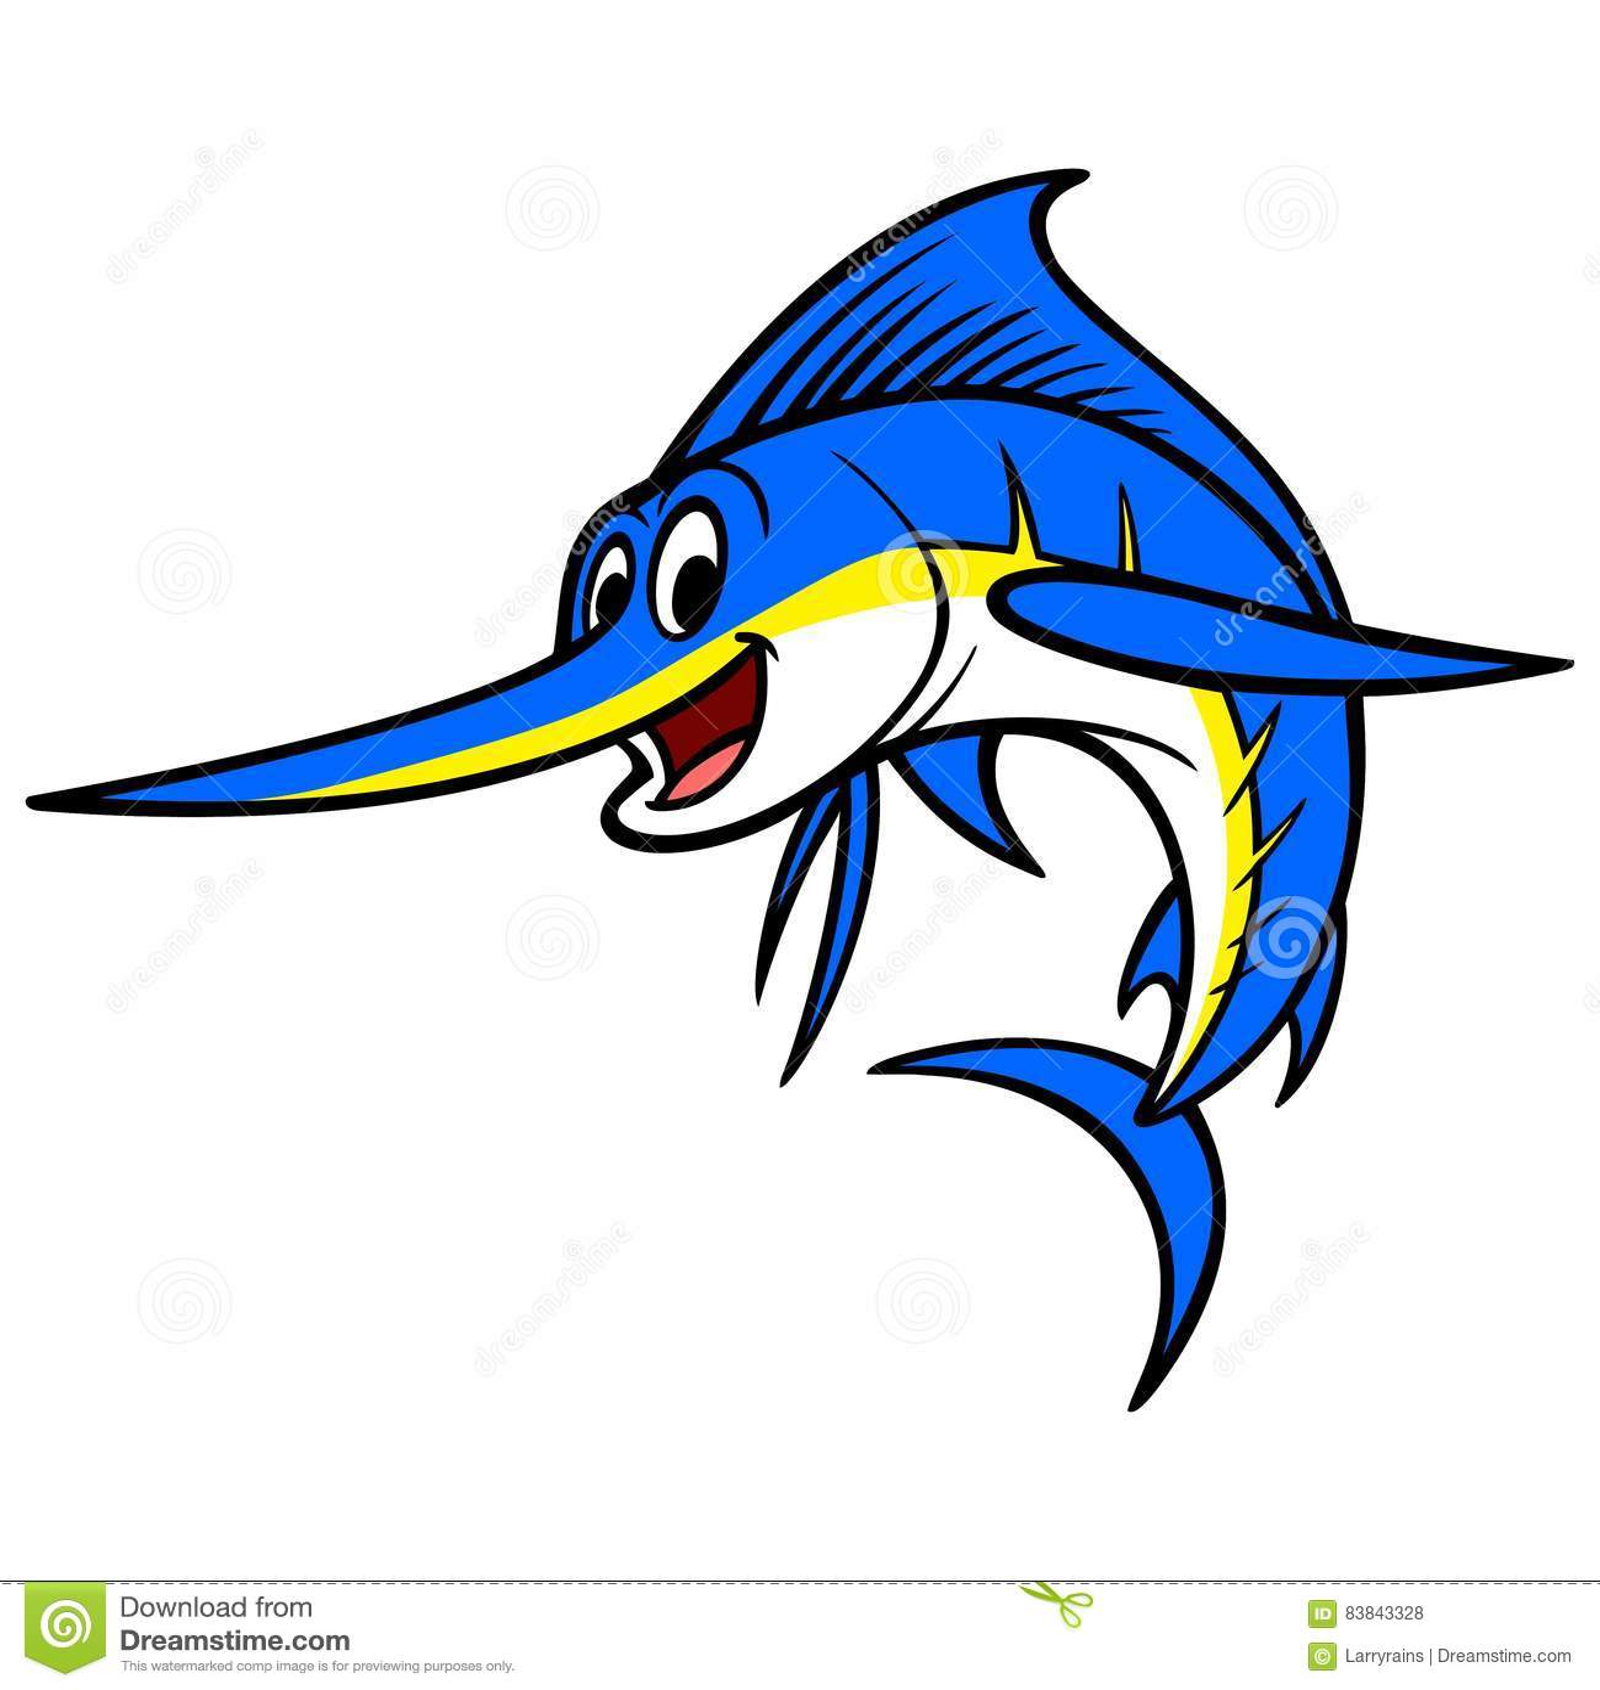 swordfish stock illustrations 1 175 swordfish stock illustrations rh dreamstime com Swordfish Stock swordfish clipart